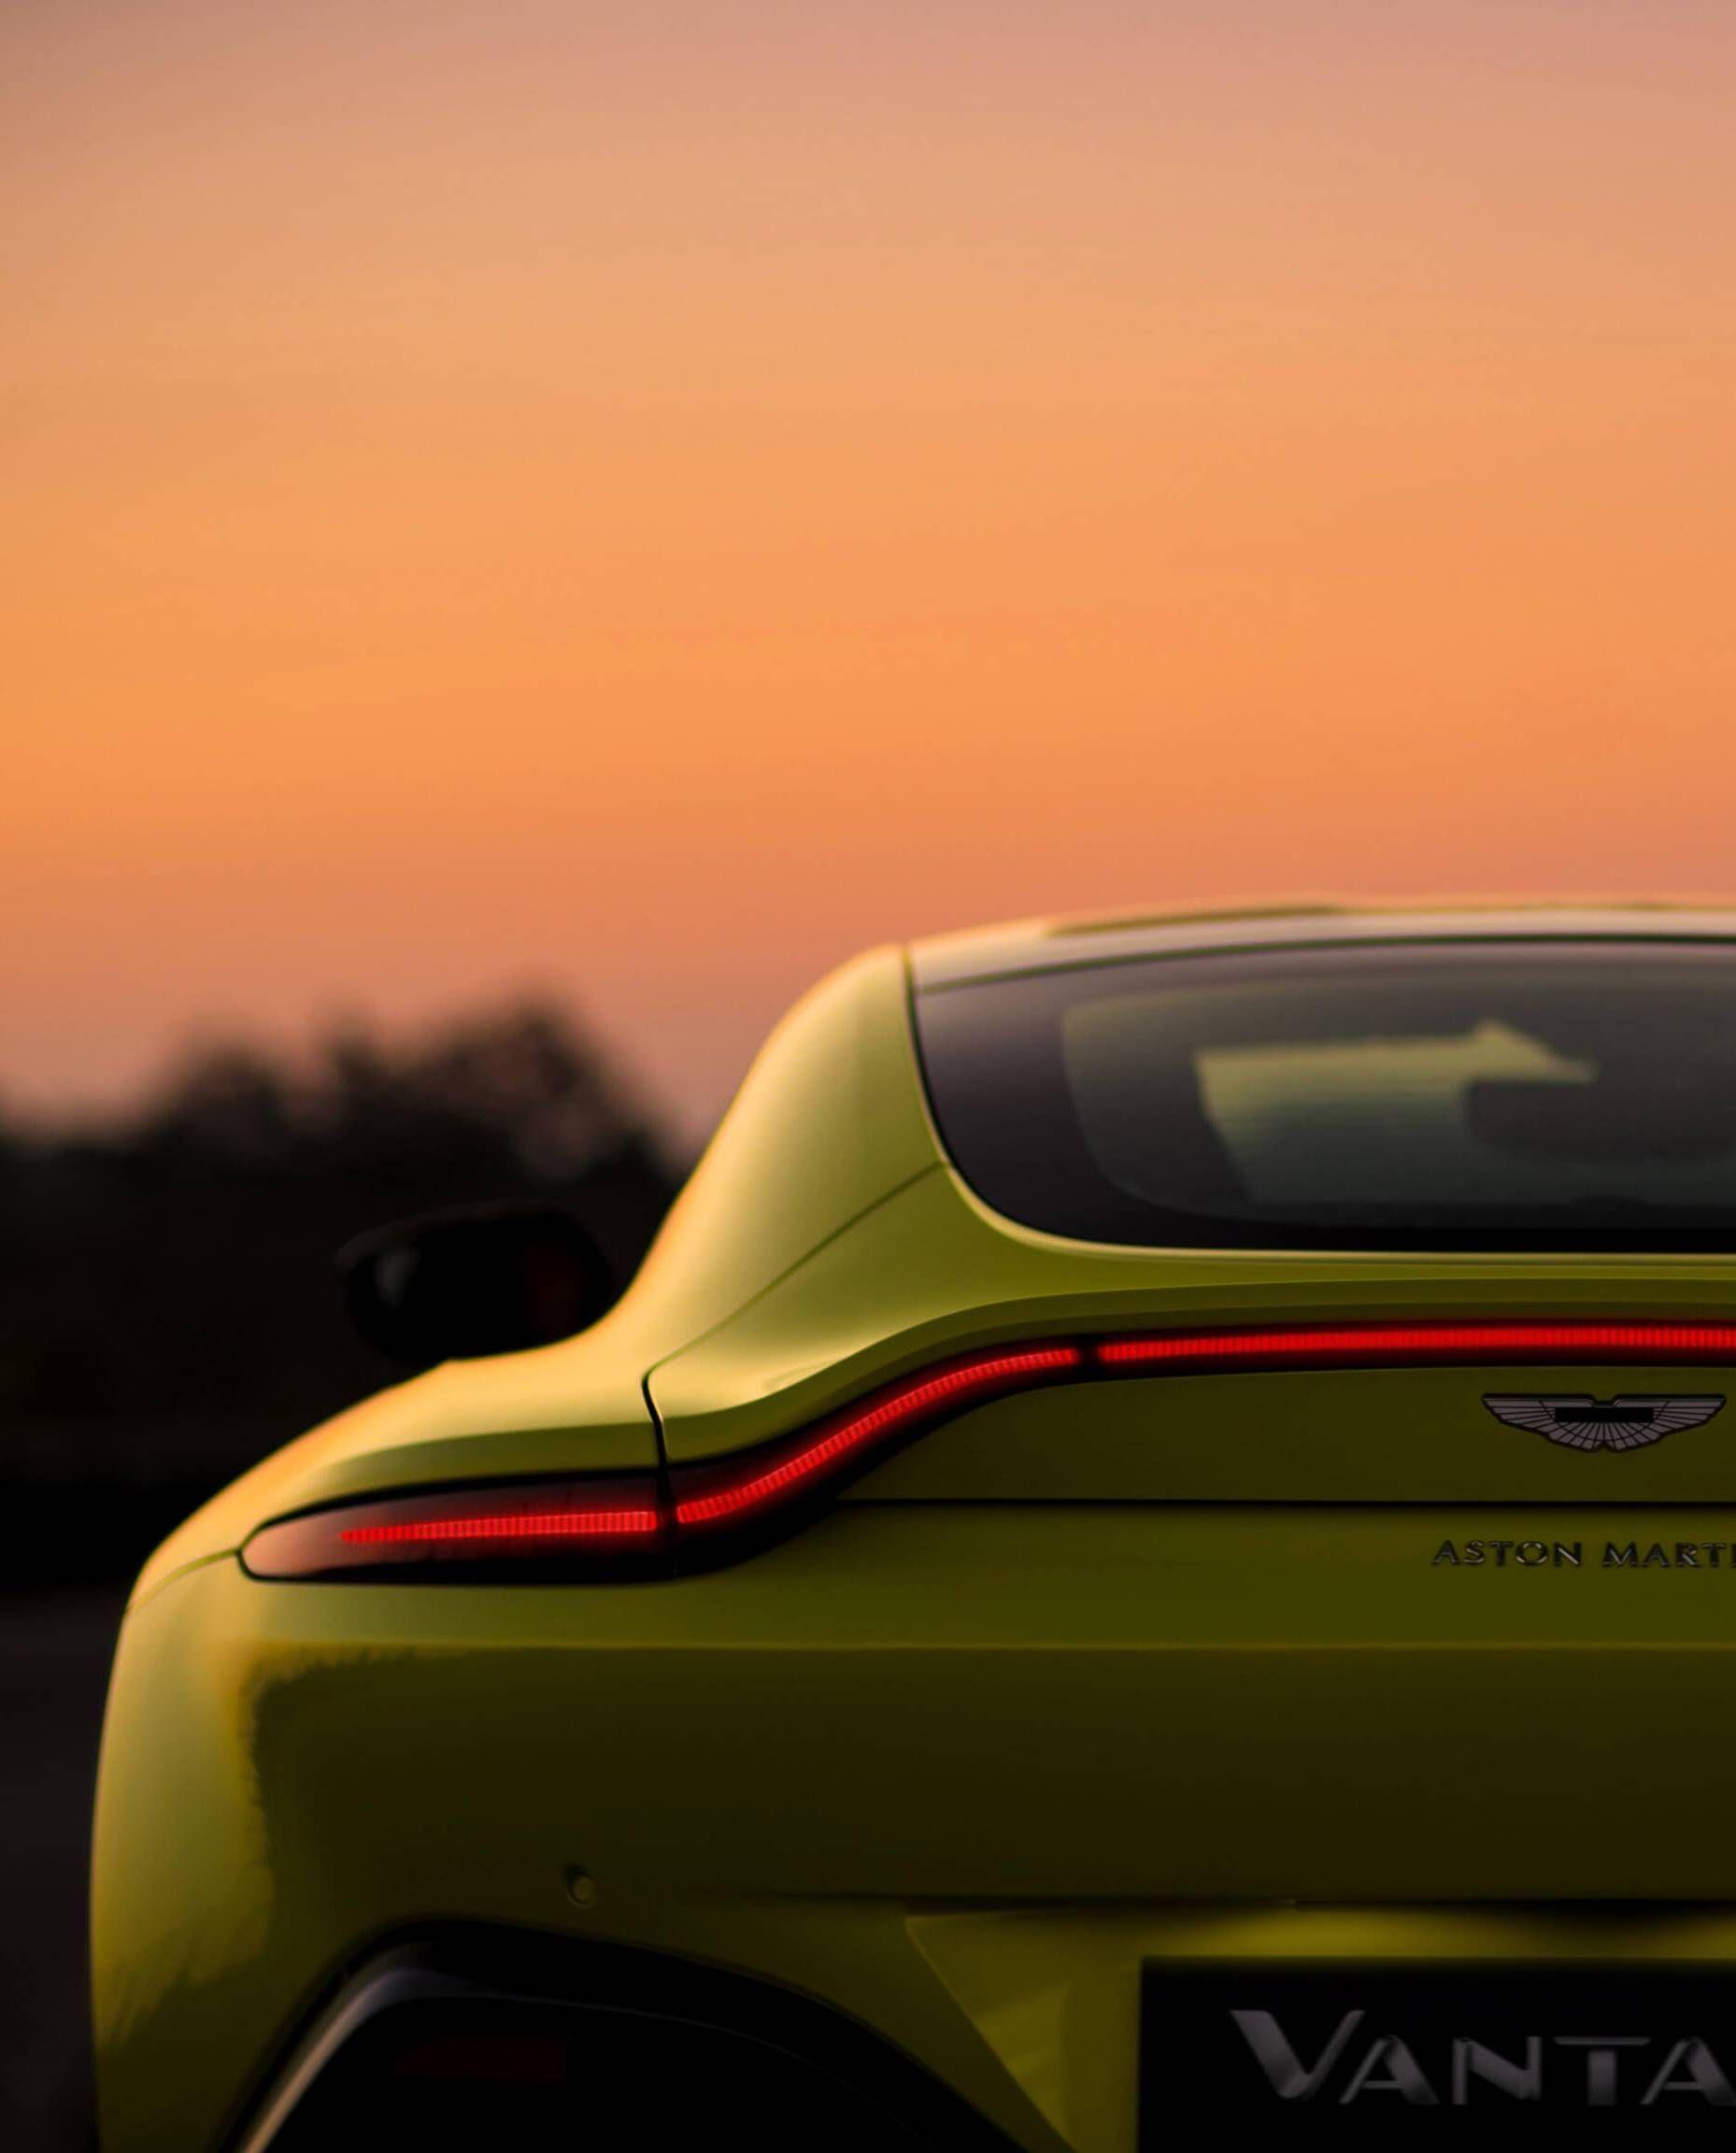 2019 Aston Martin Vantage #AstonMartinclassiccars